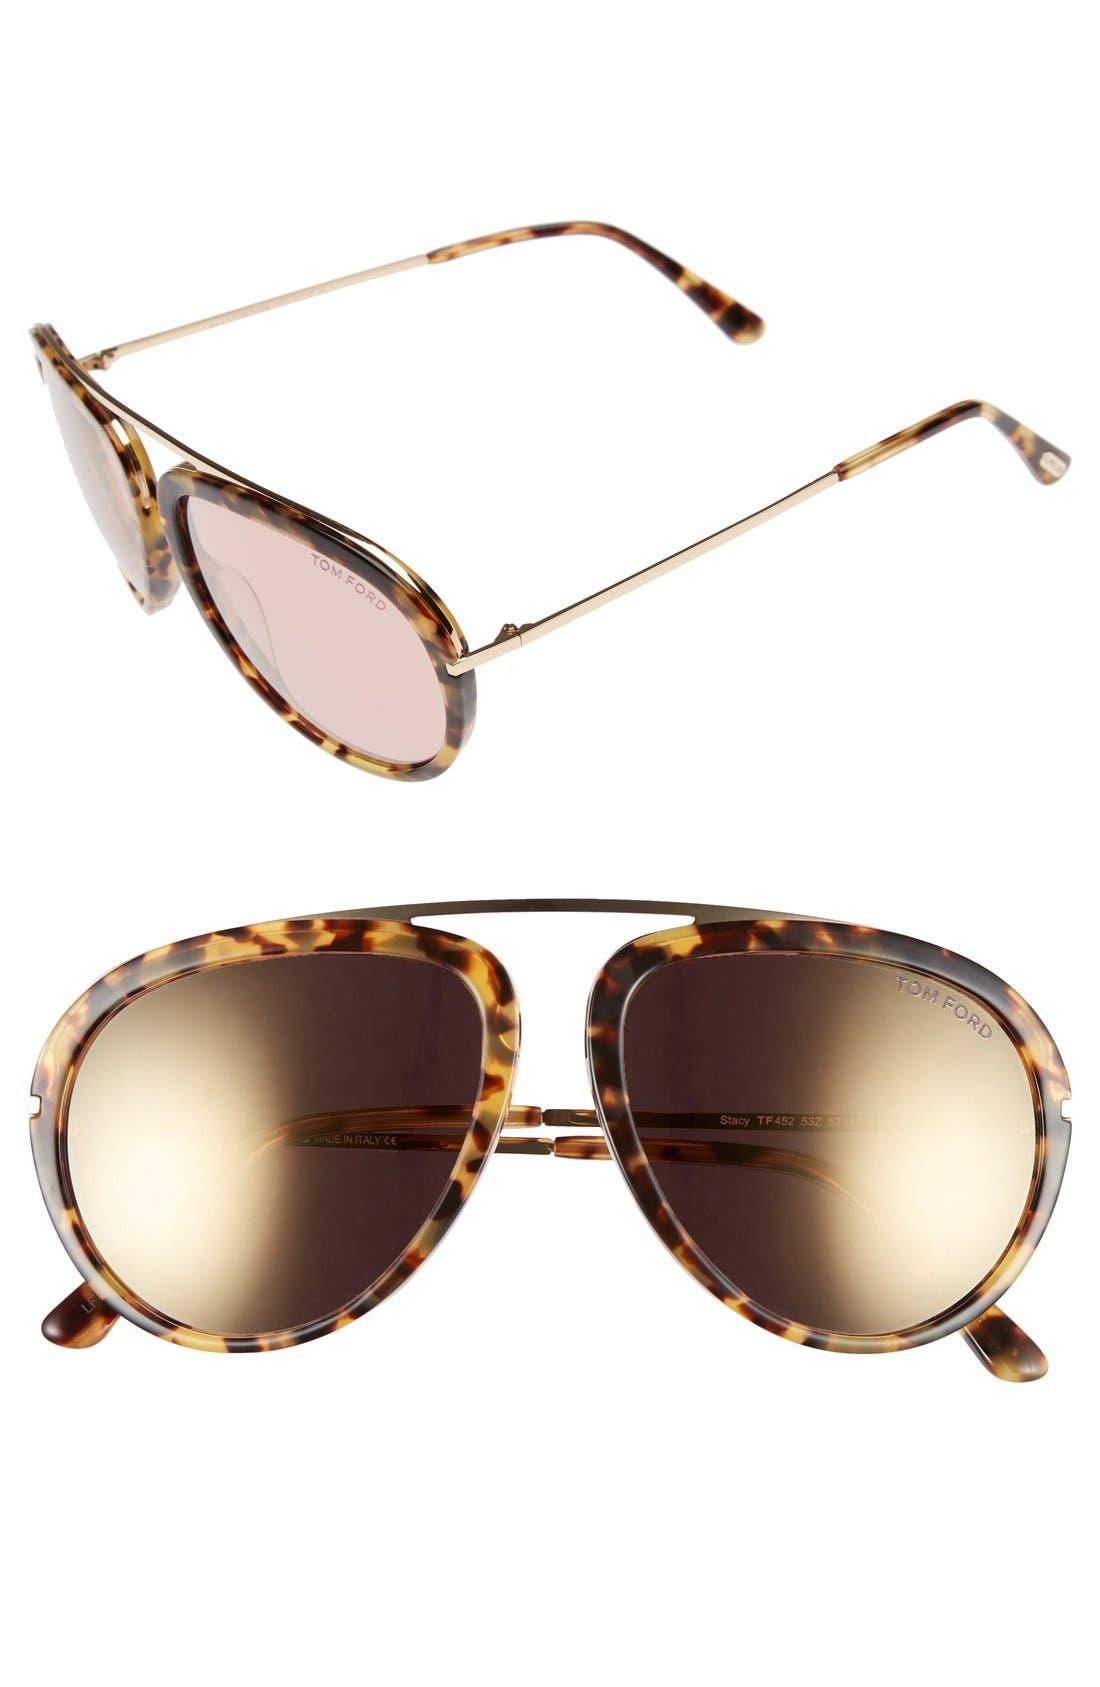 Tom Ford 'Stacy' 57mm Aviator Sunglasses